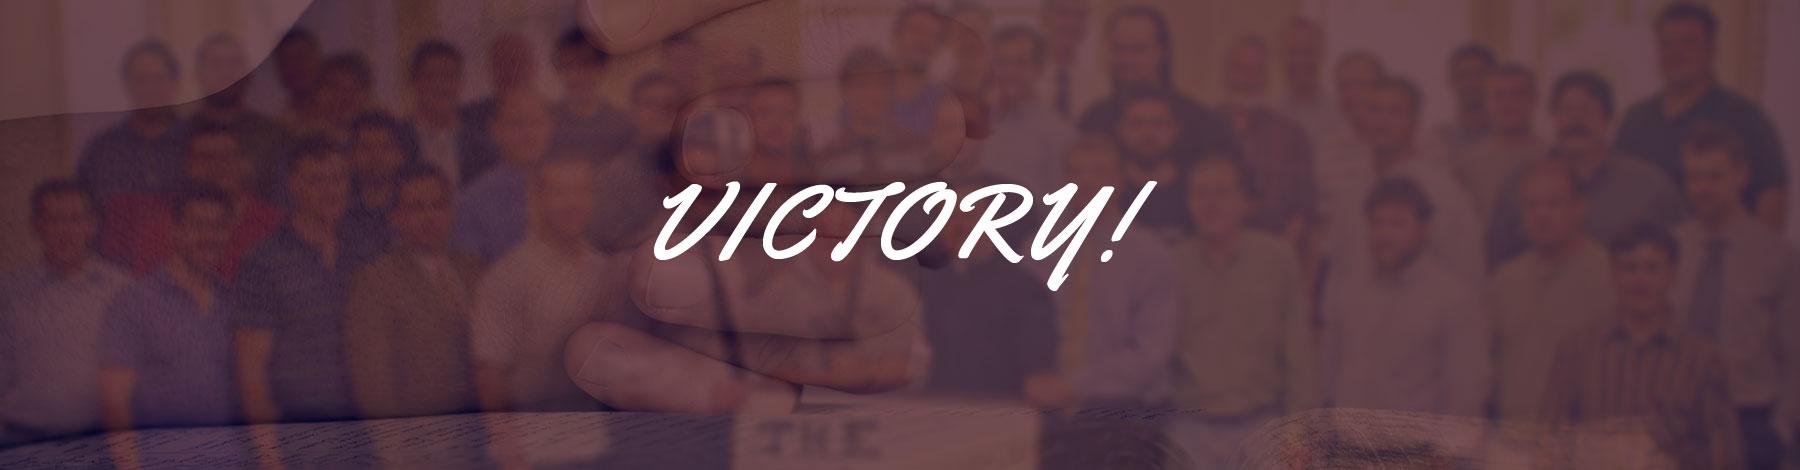 Courageous-Men-Victory-1-15-15